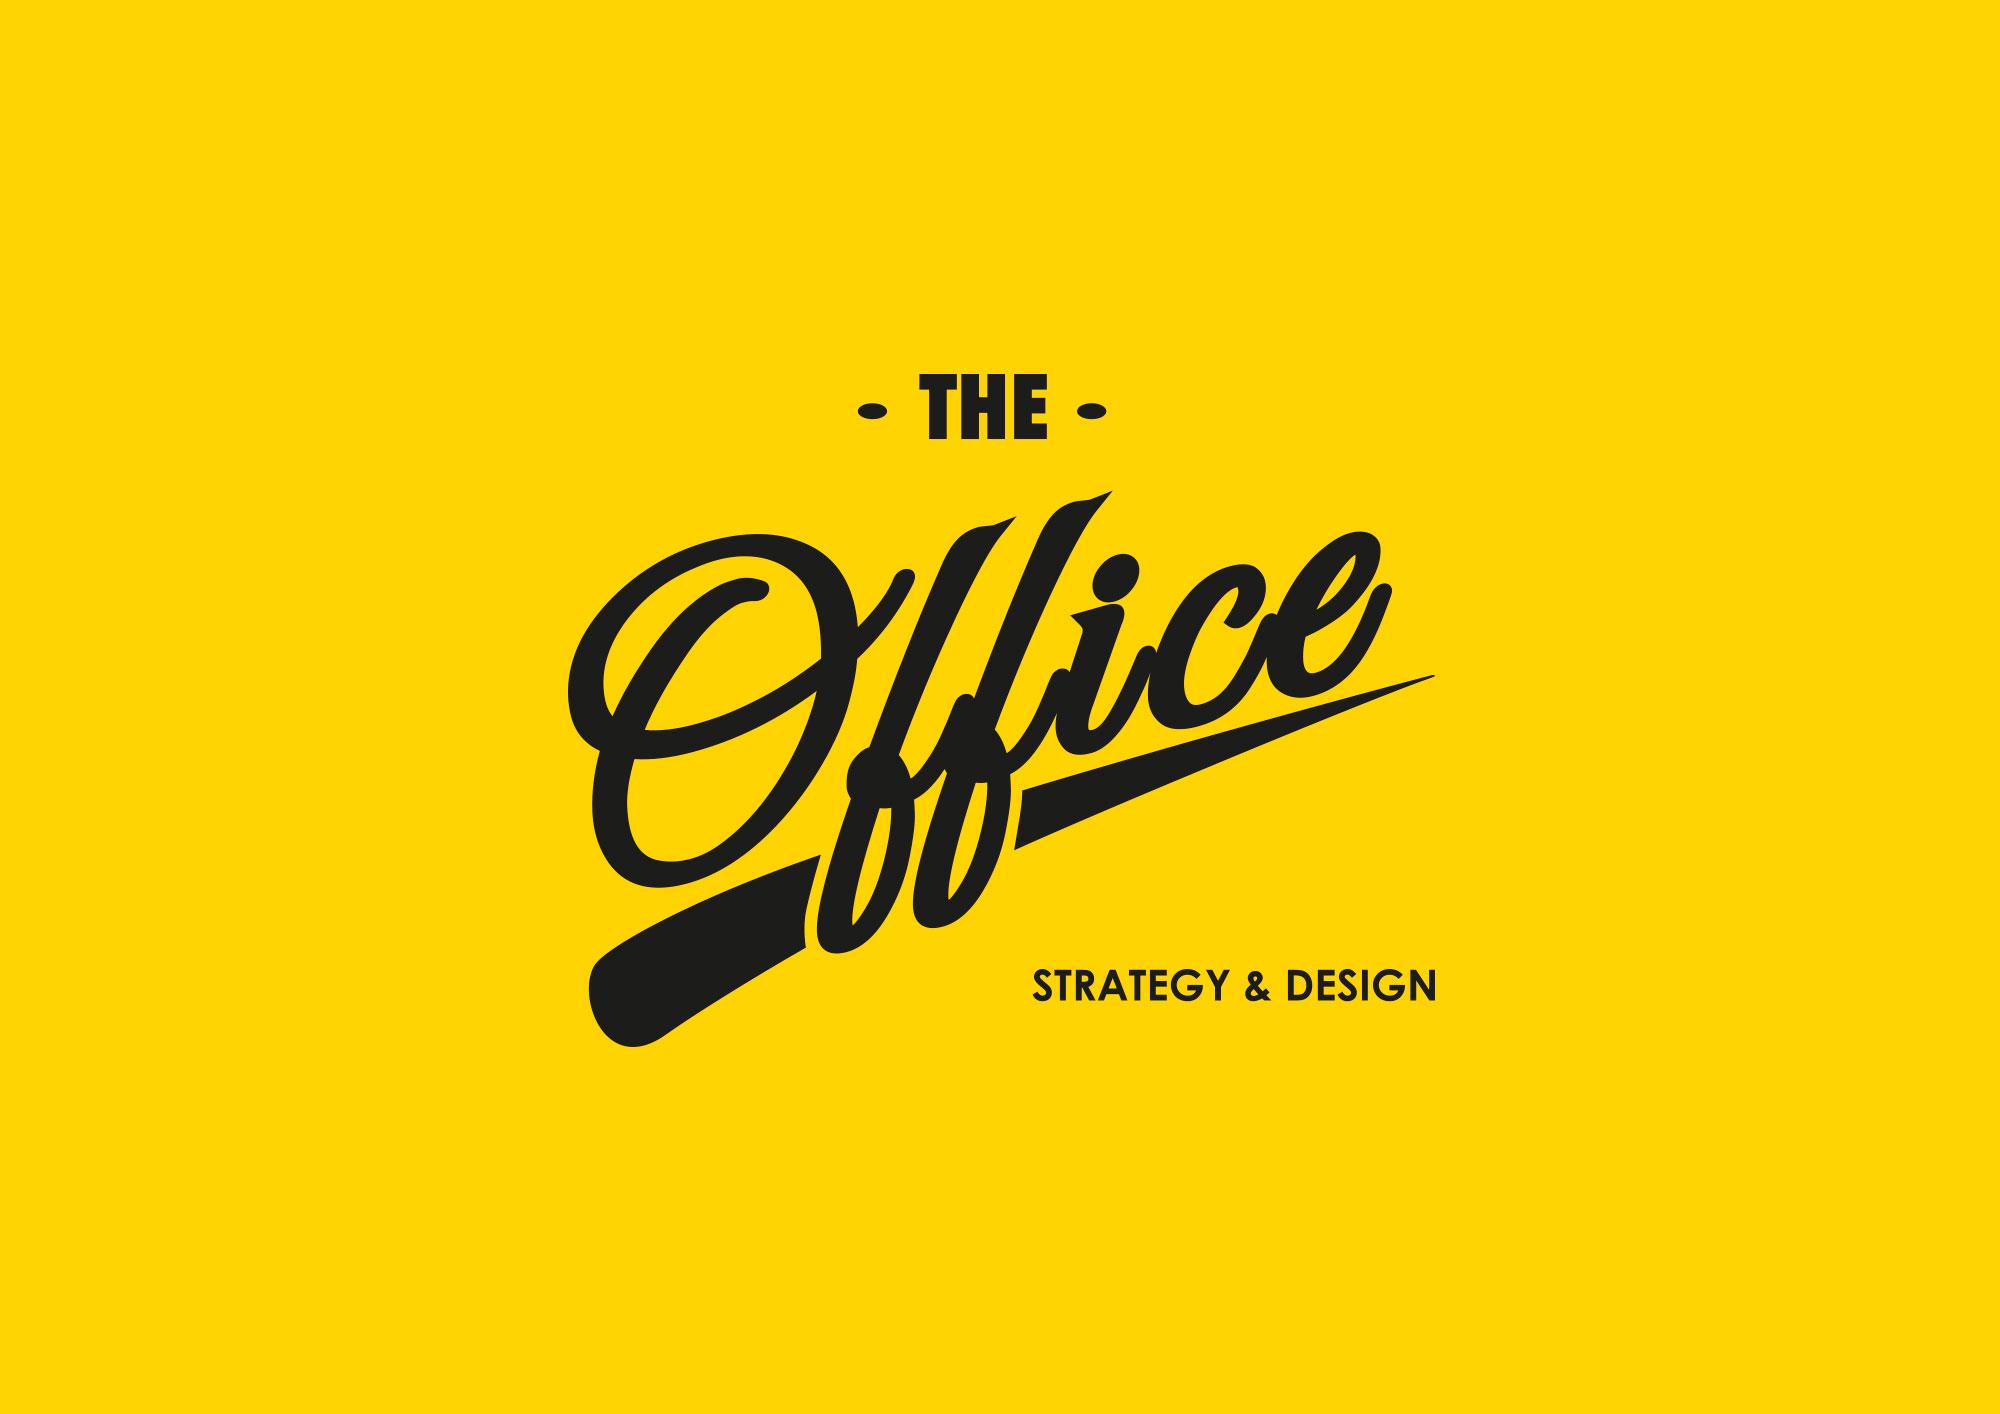 THE-OFFICE_theoffice01.jpg